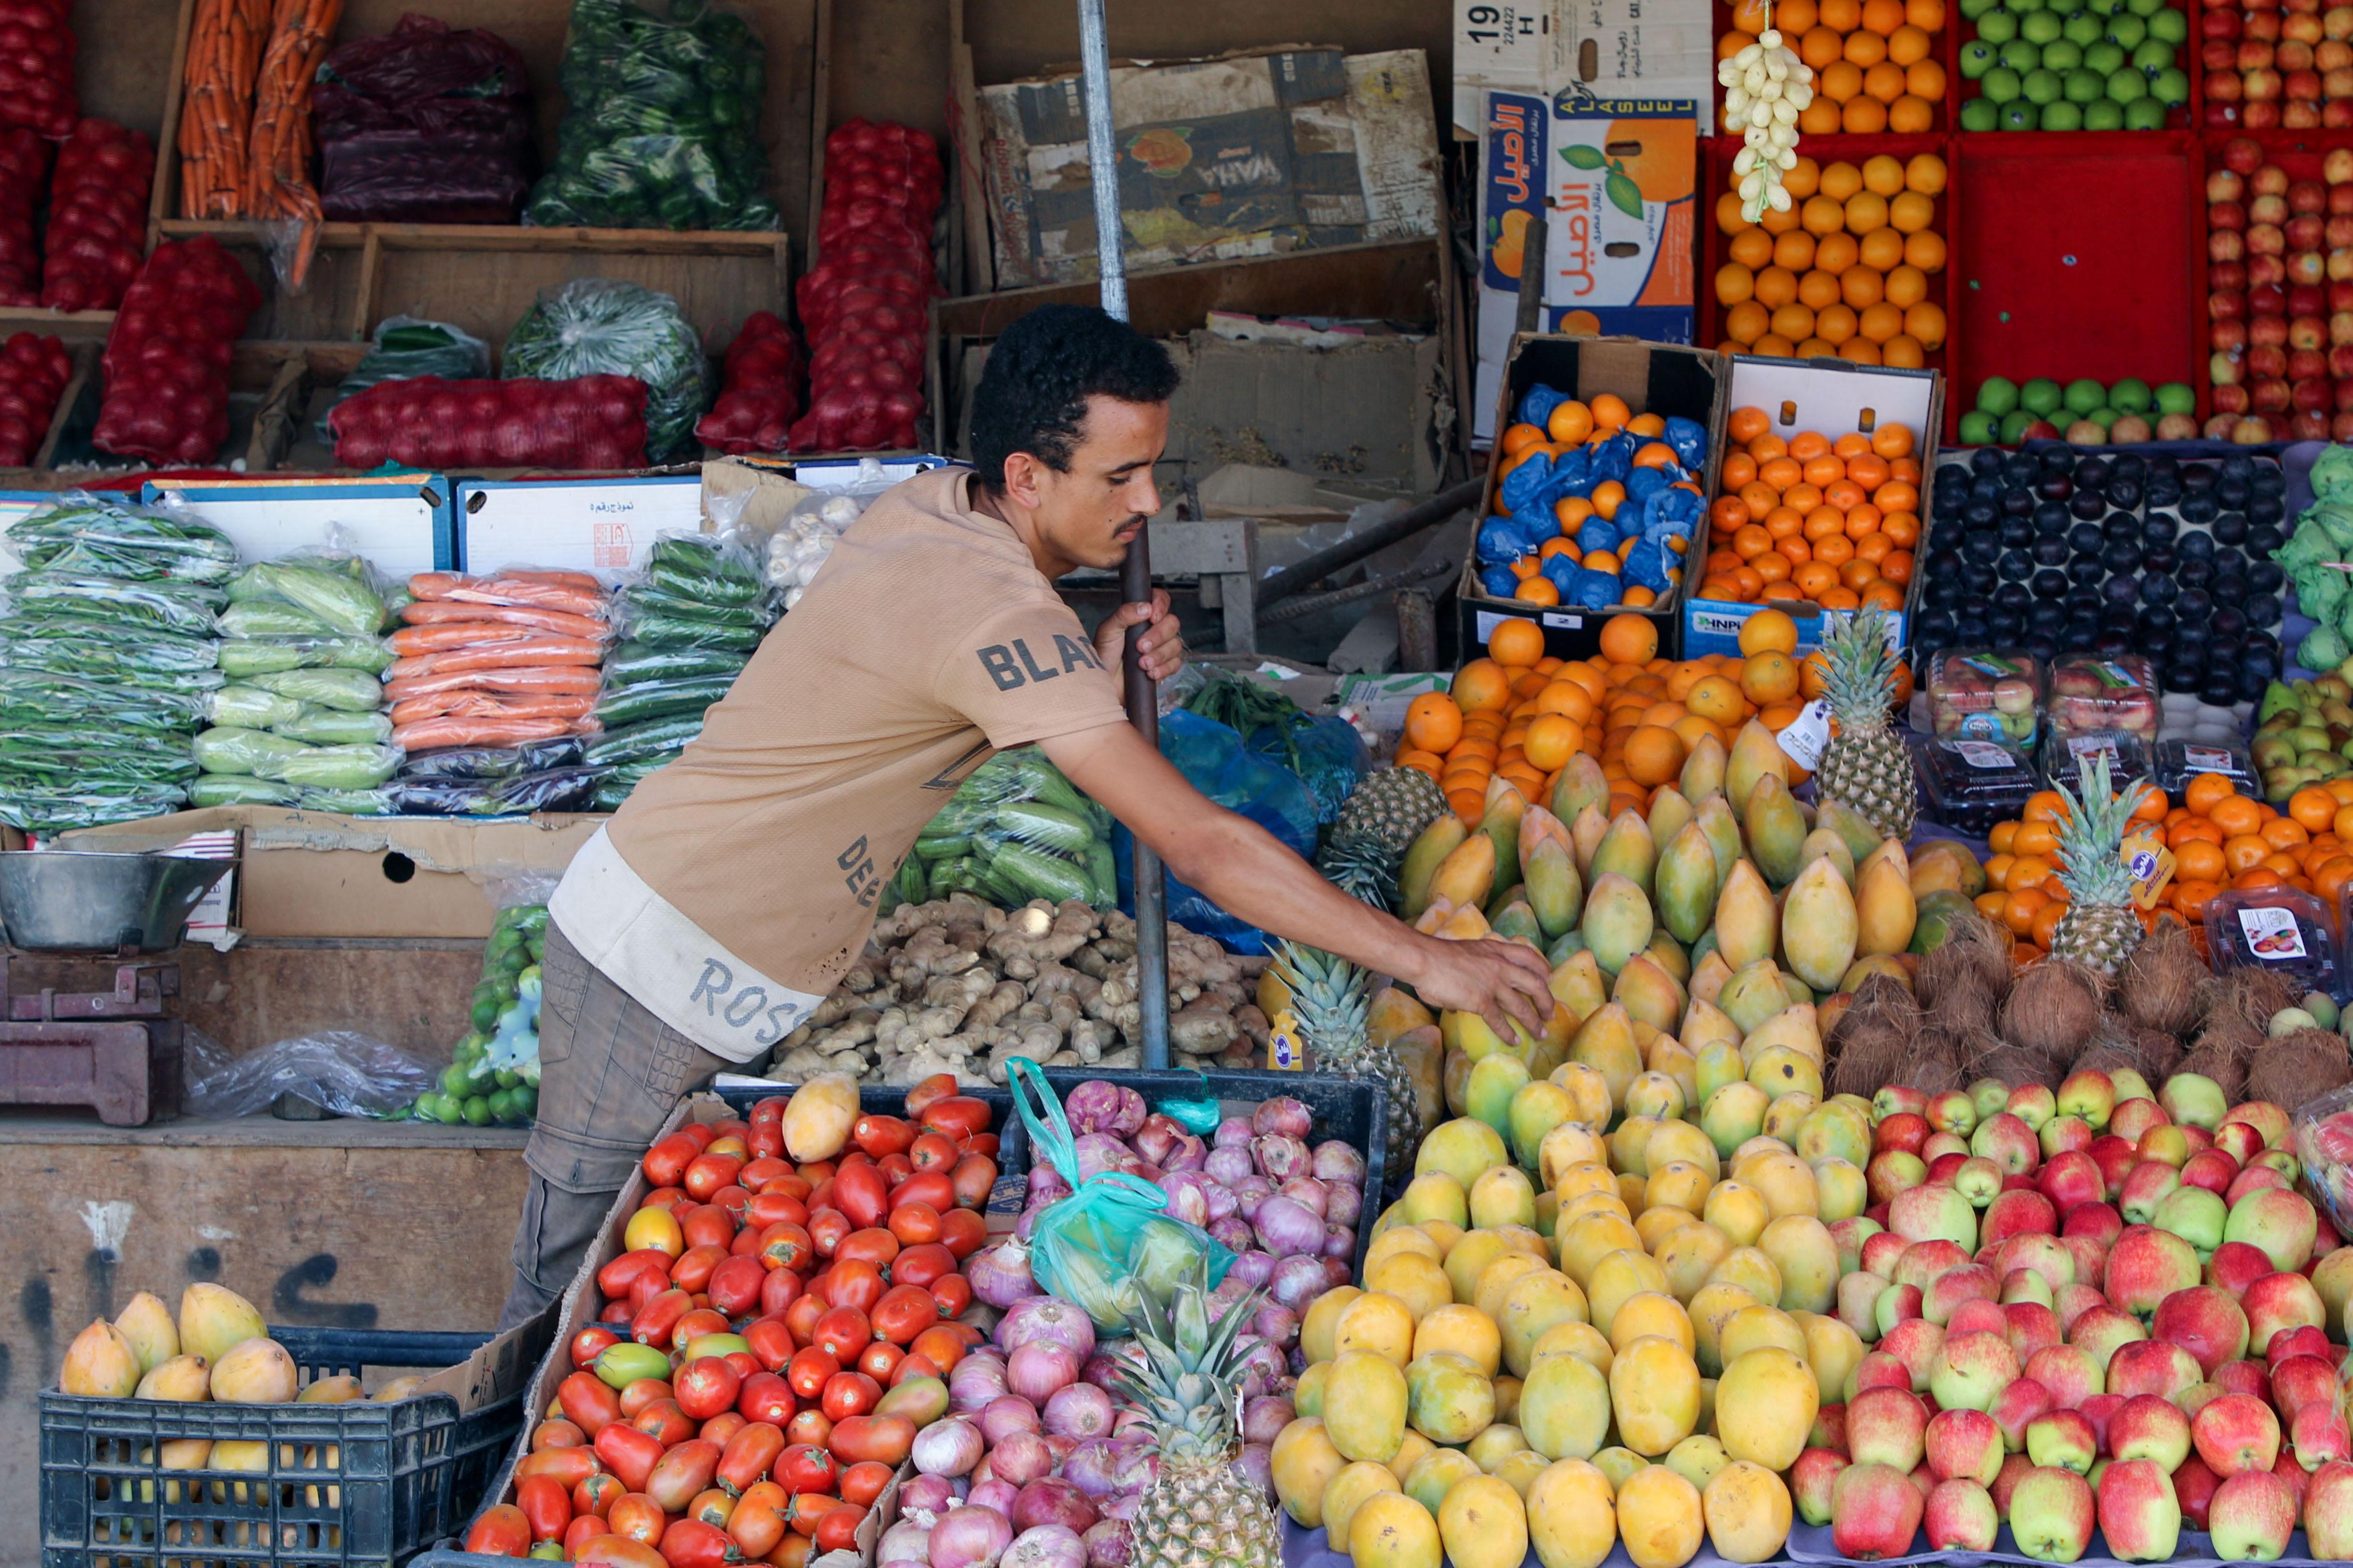 A vendor sorts fruits at his stall in Aden, Yemen June 29, 2021. Picture taken June 29, 2021. REUTERS/Fawaz Salman